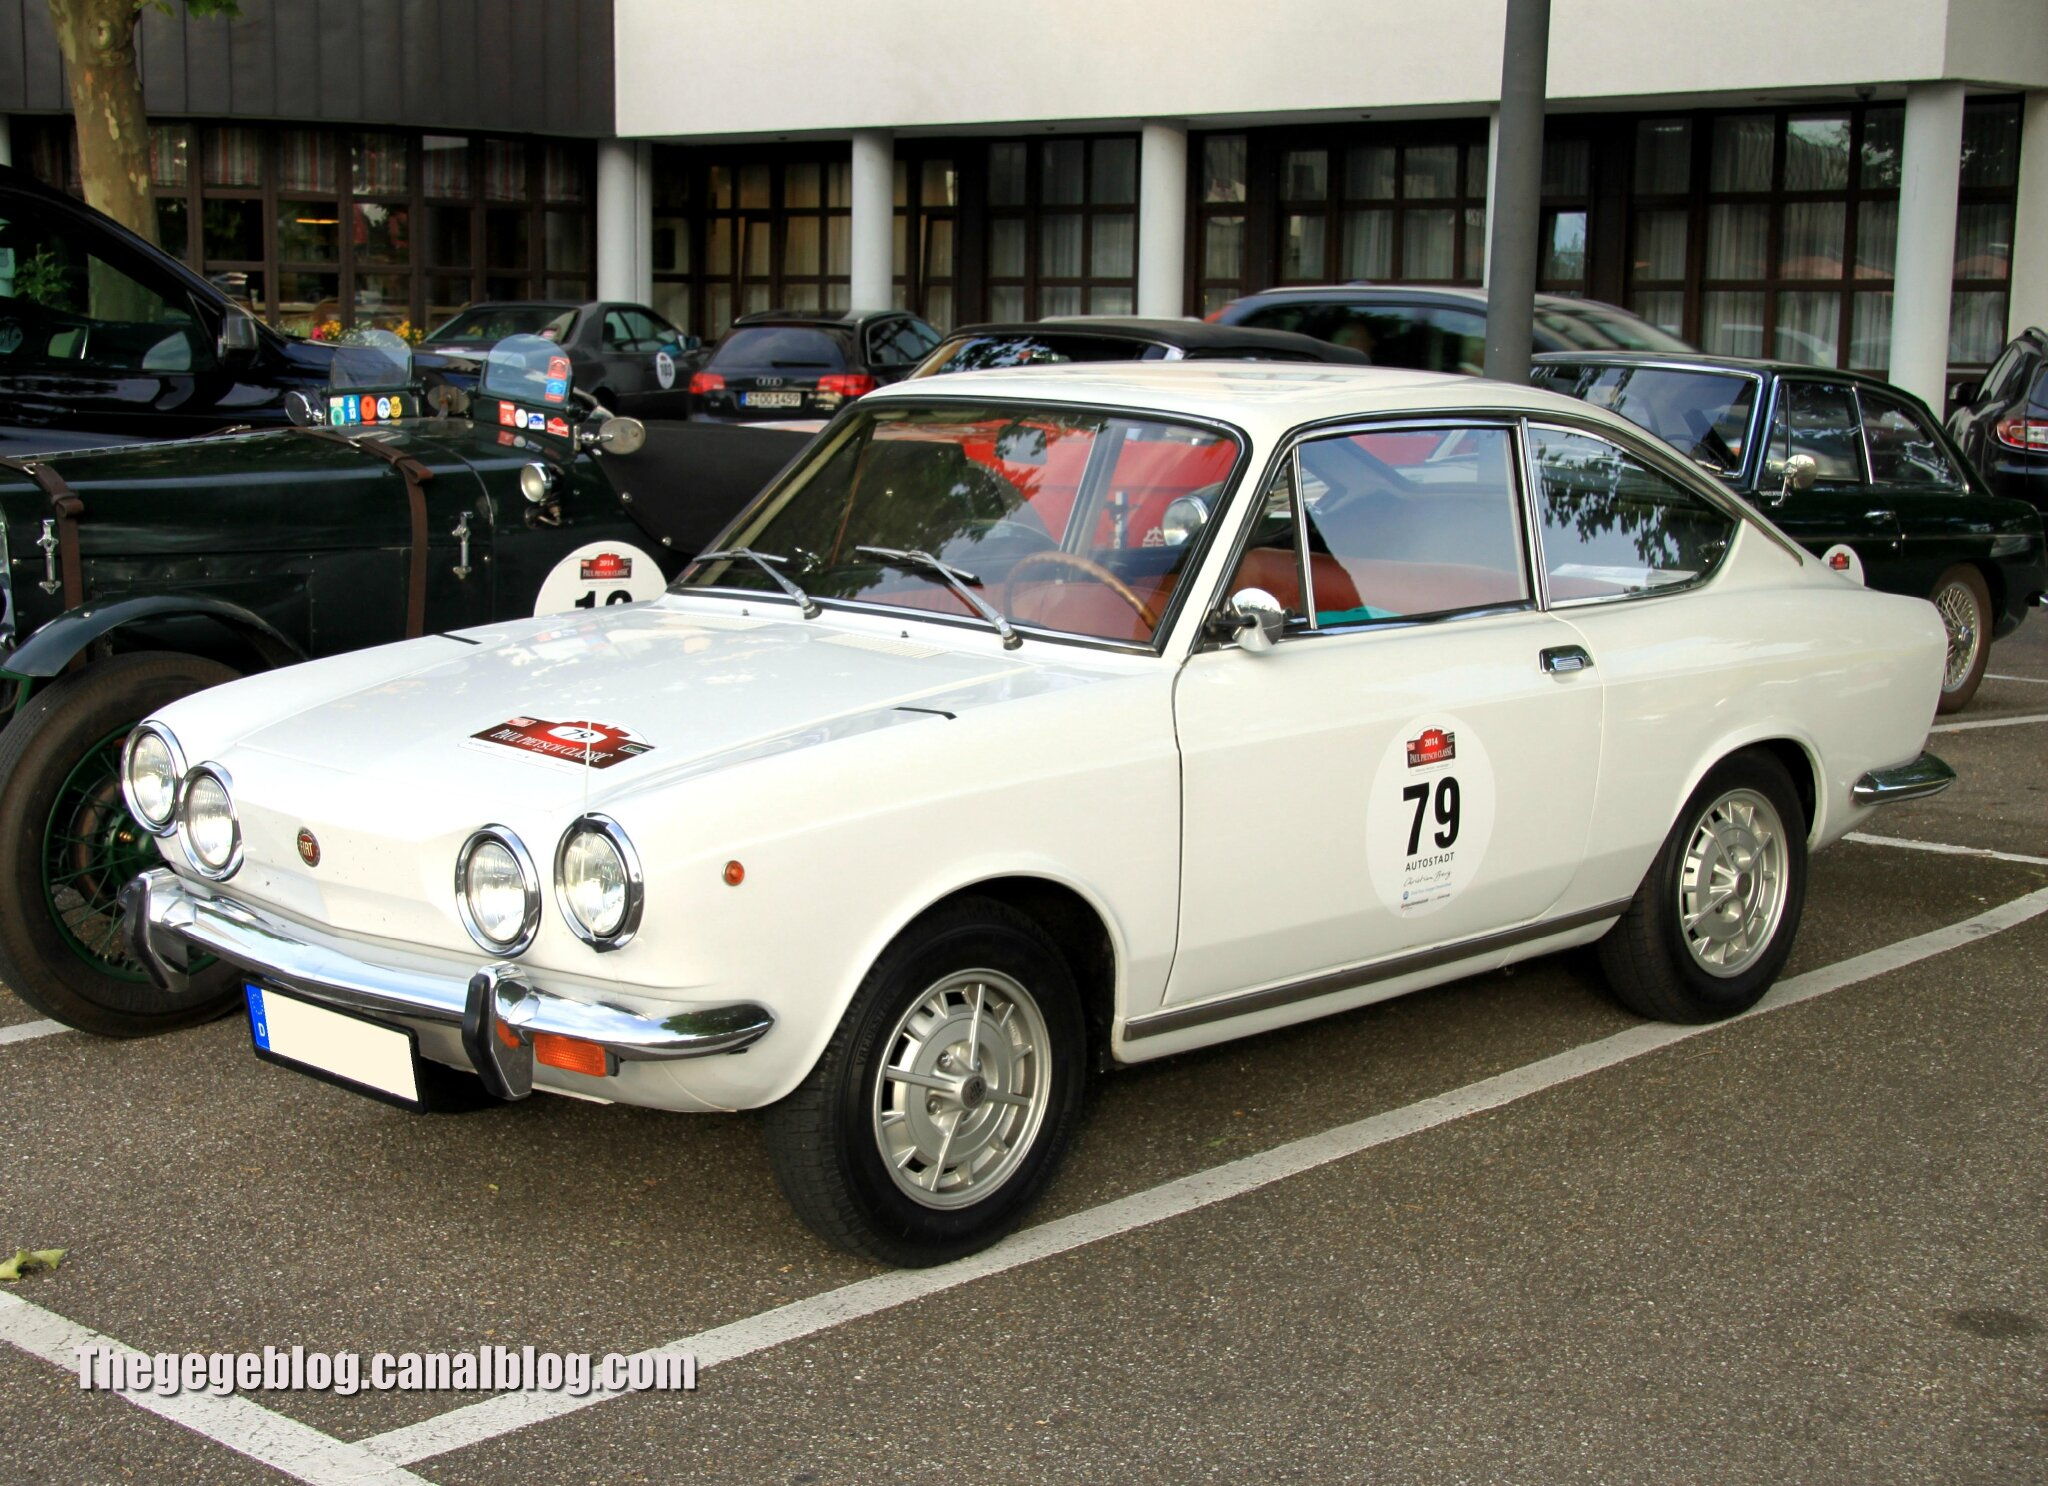 Fiat 850 sport coup 1971 1972 paul pietsch classic 2014 the g g blog - Fiat 850 coupe sport a vendre ...